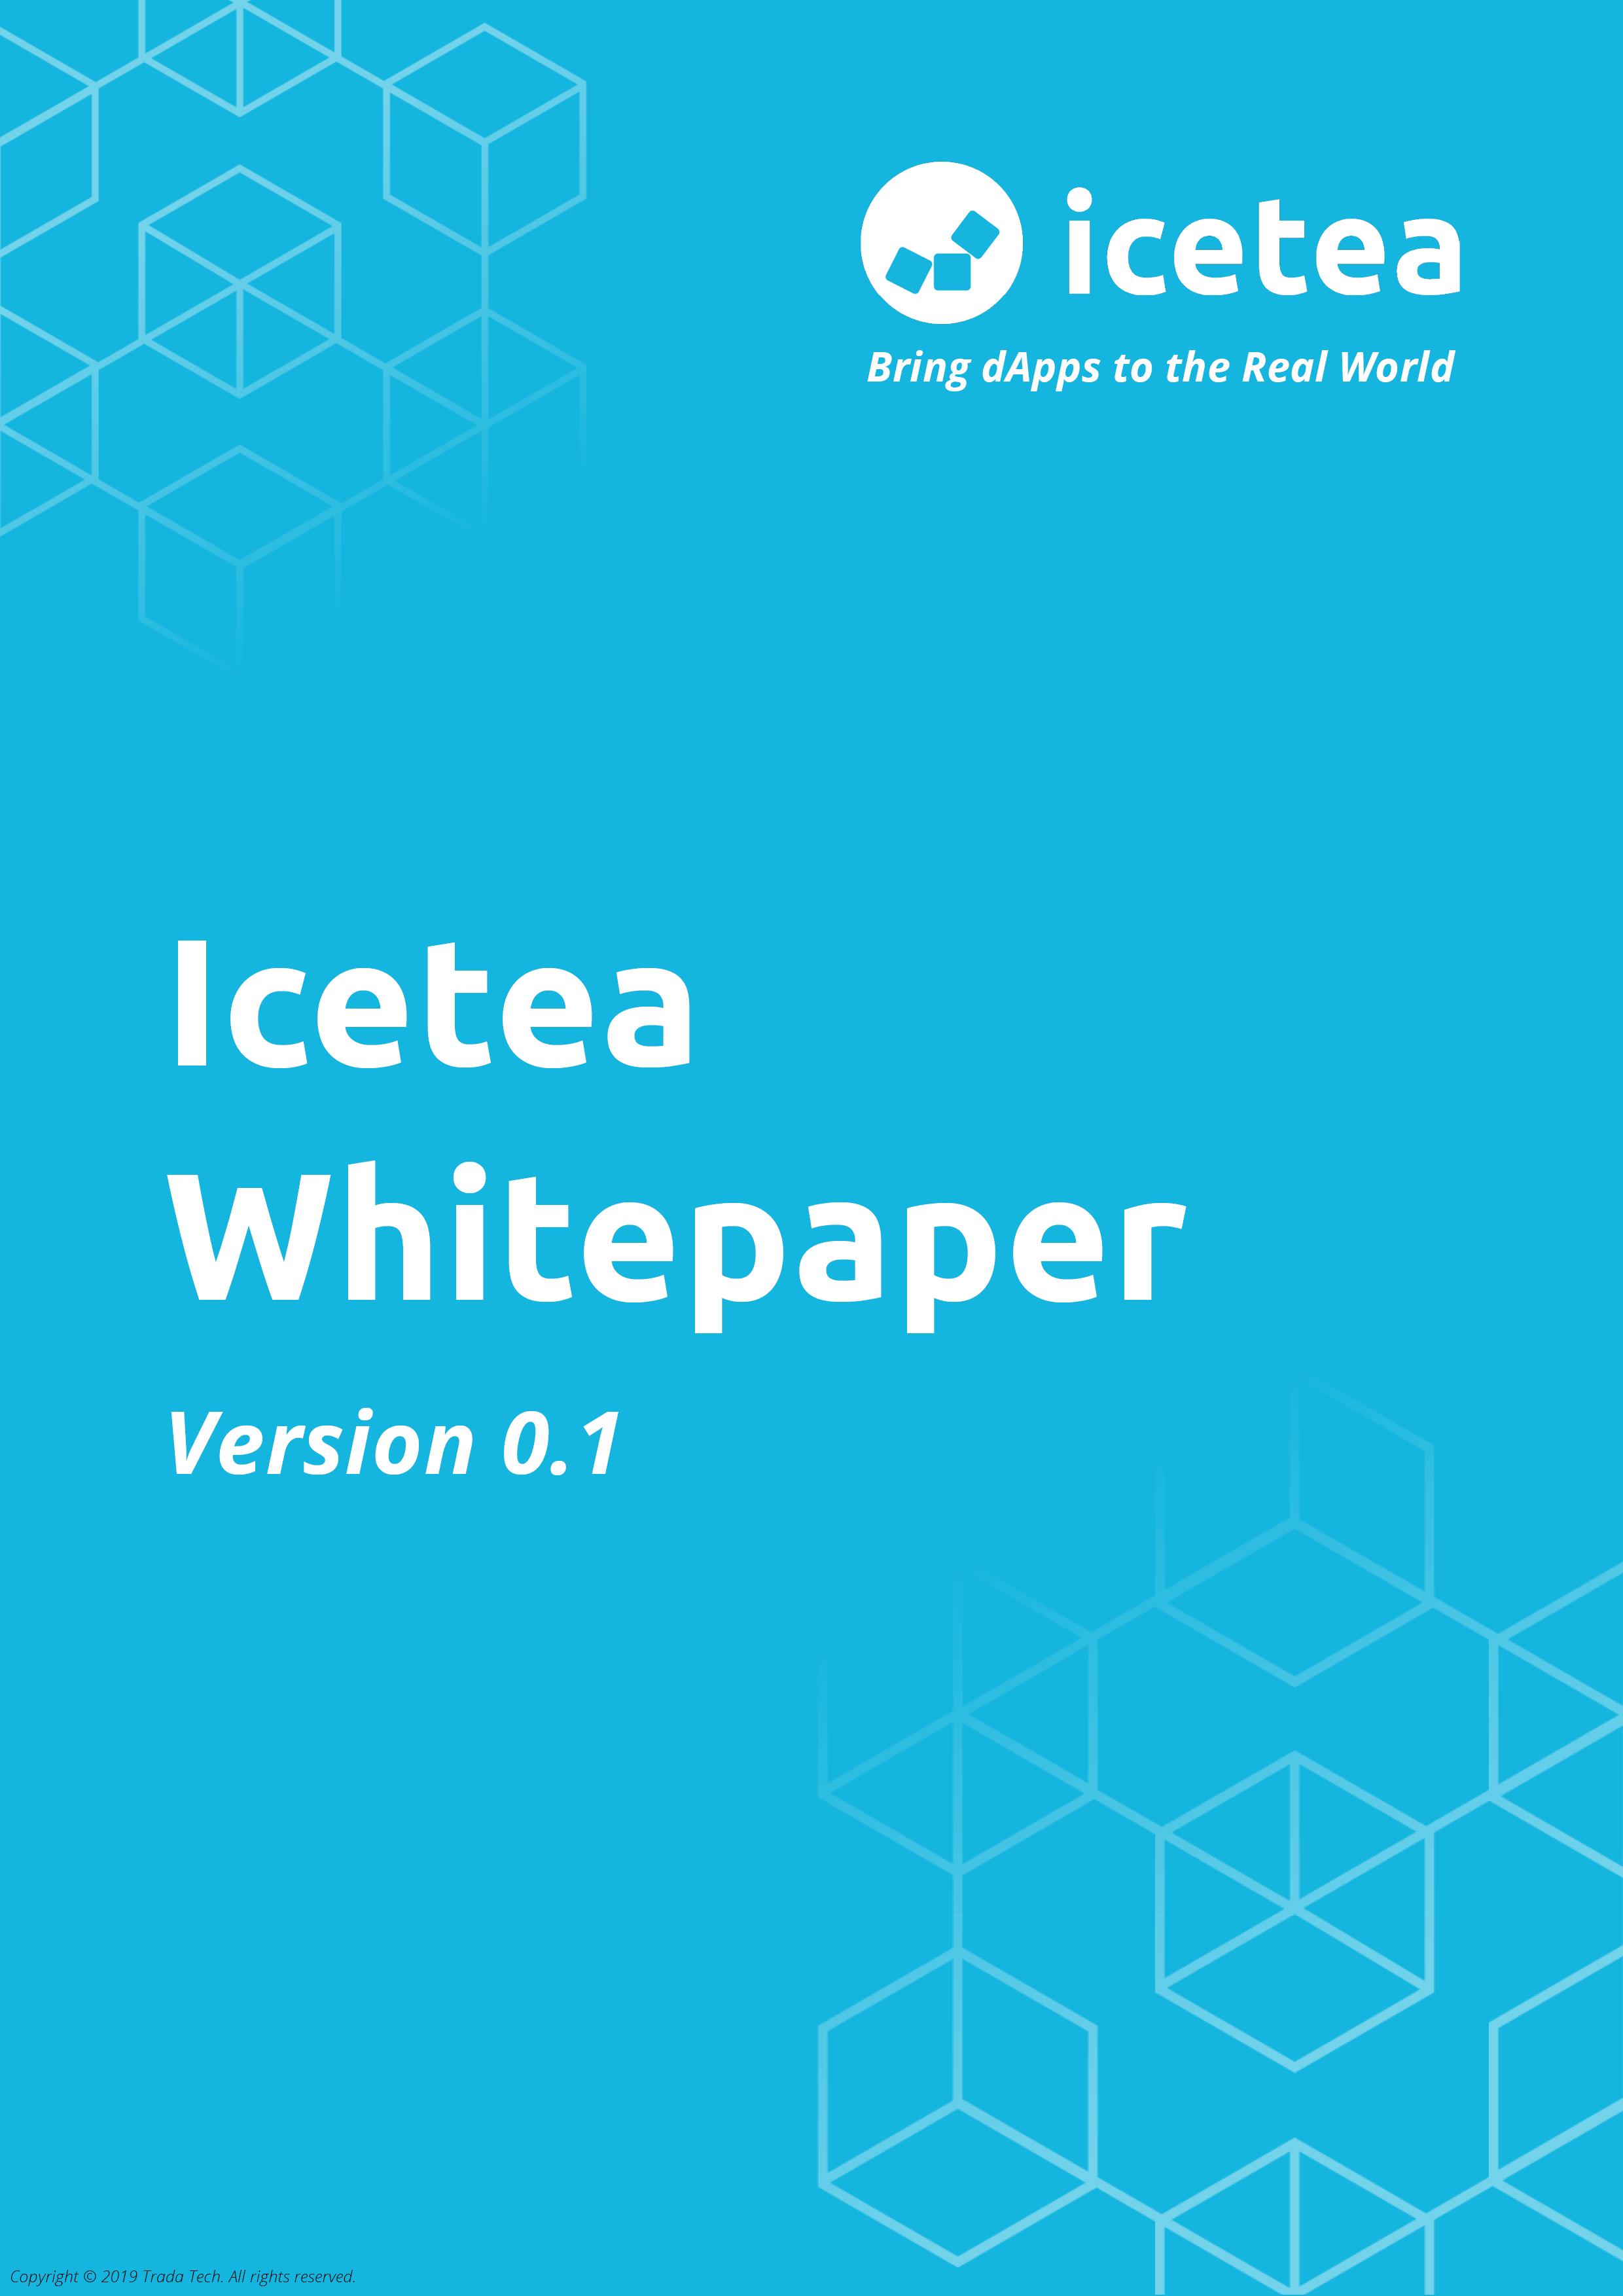 Icetea Whitepaper